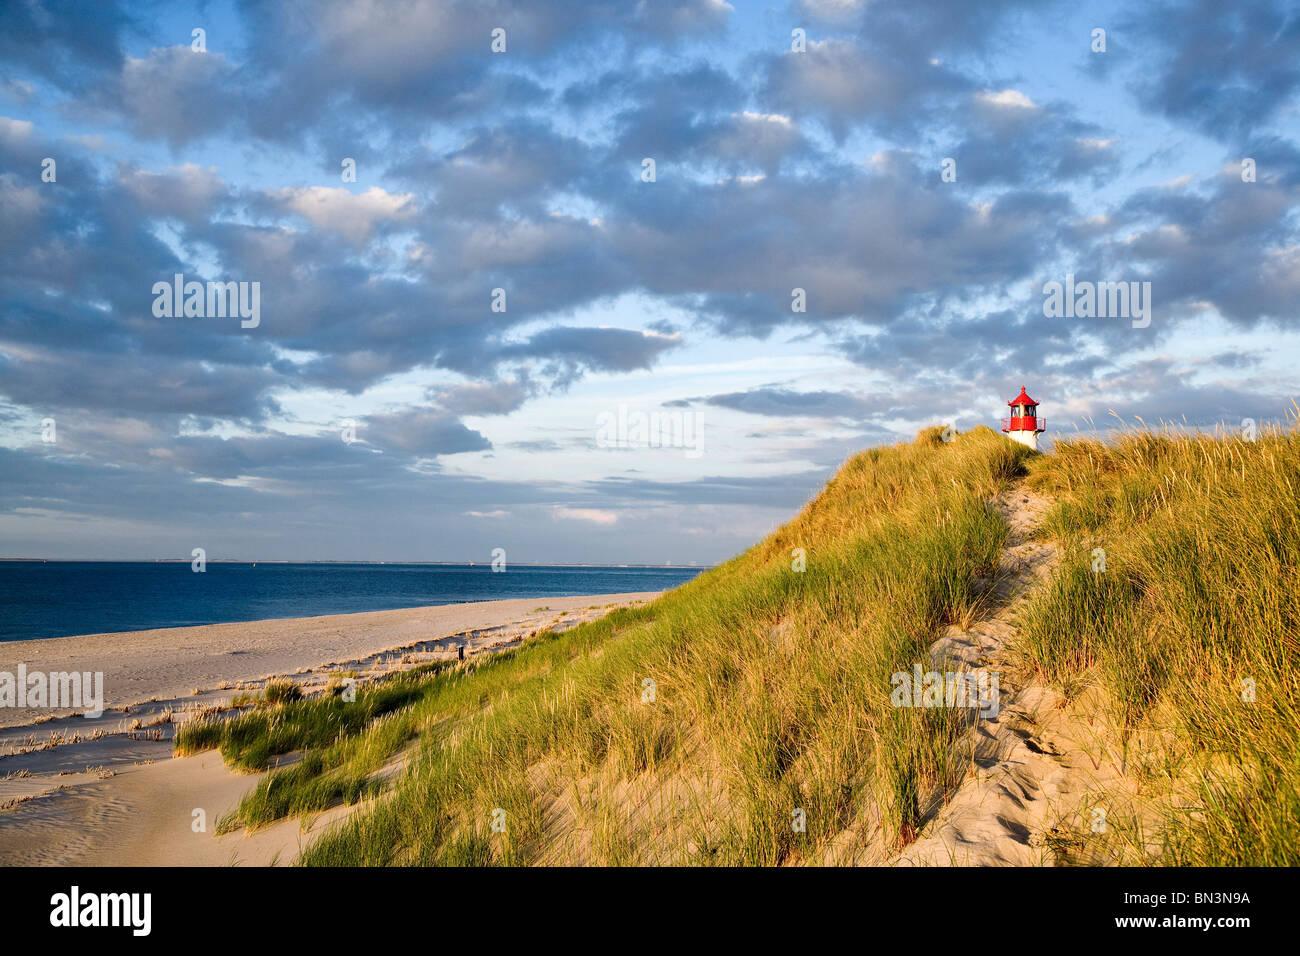 Dunes at a coast, lighthouse List-Ost in the background, Ellenbogen, Sylt, Germany - Stock Image